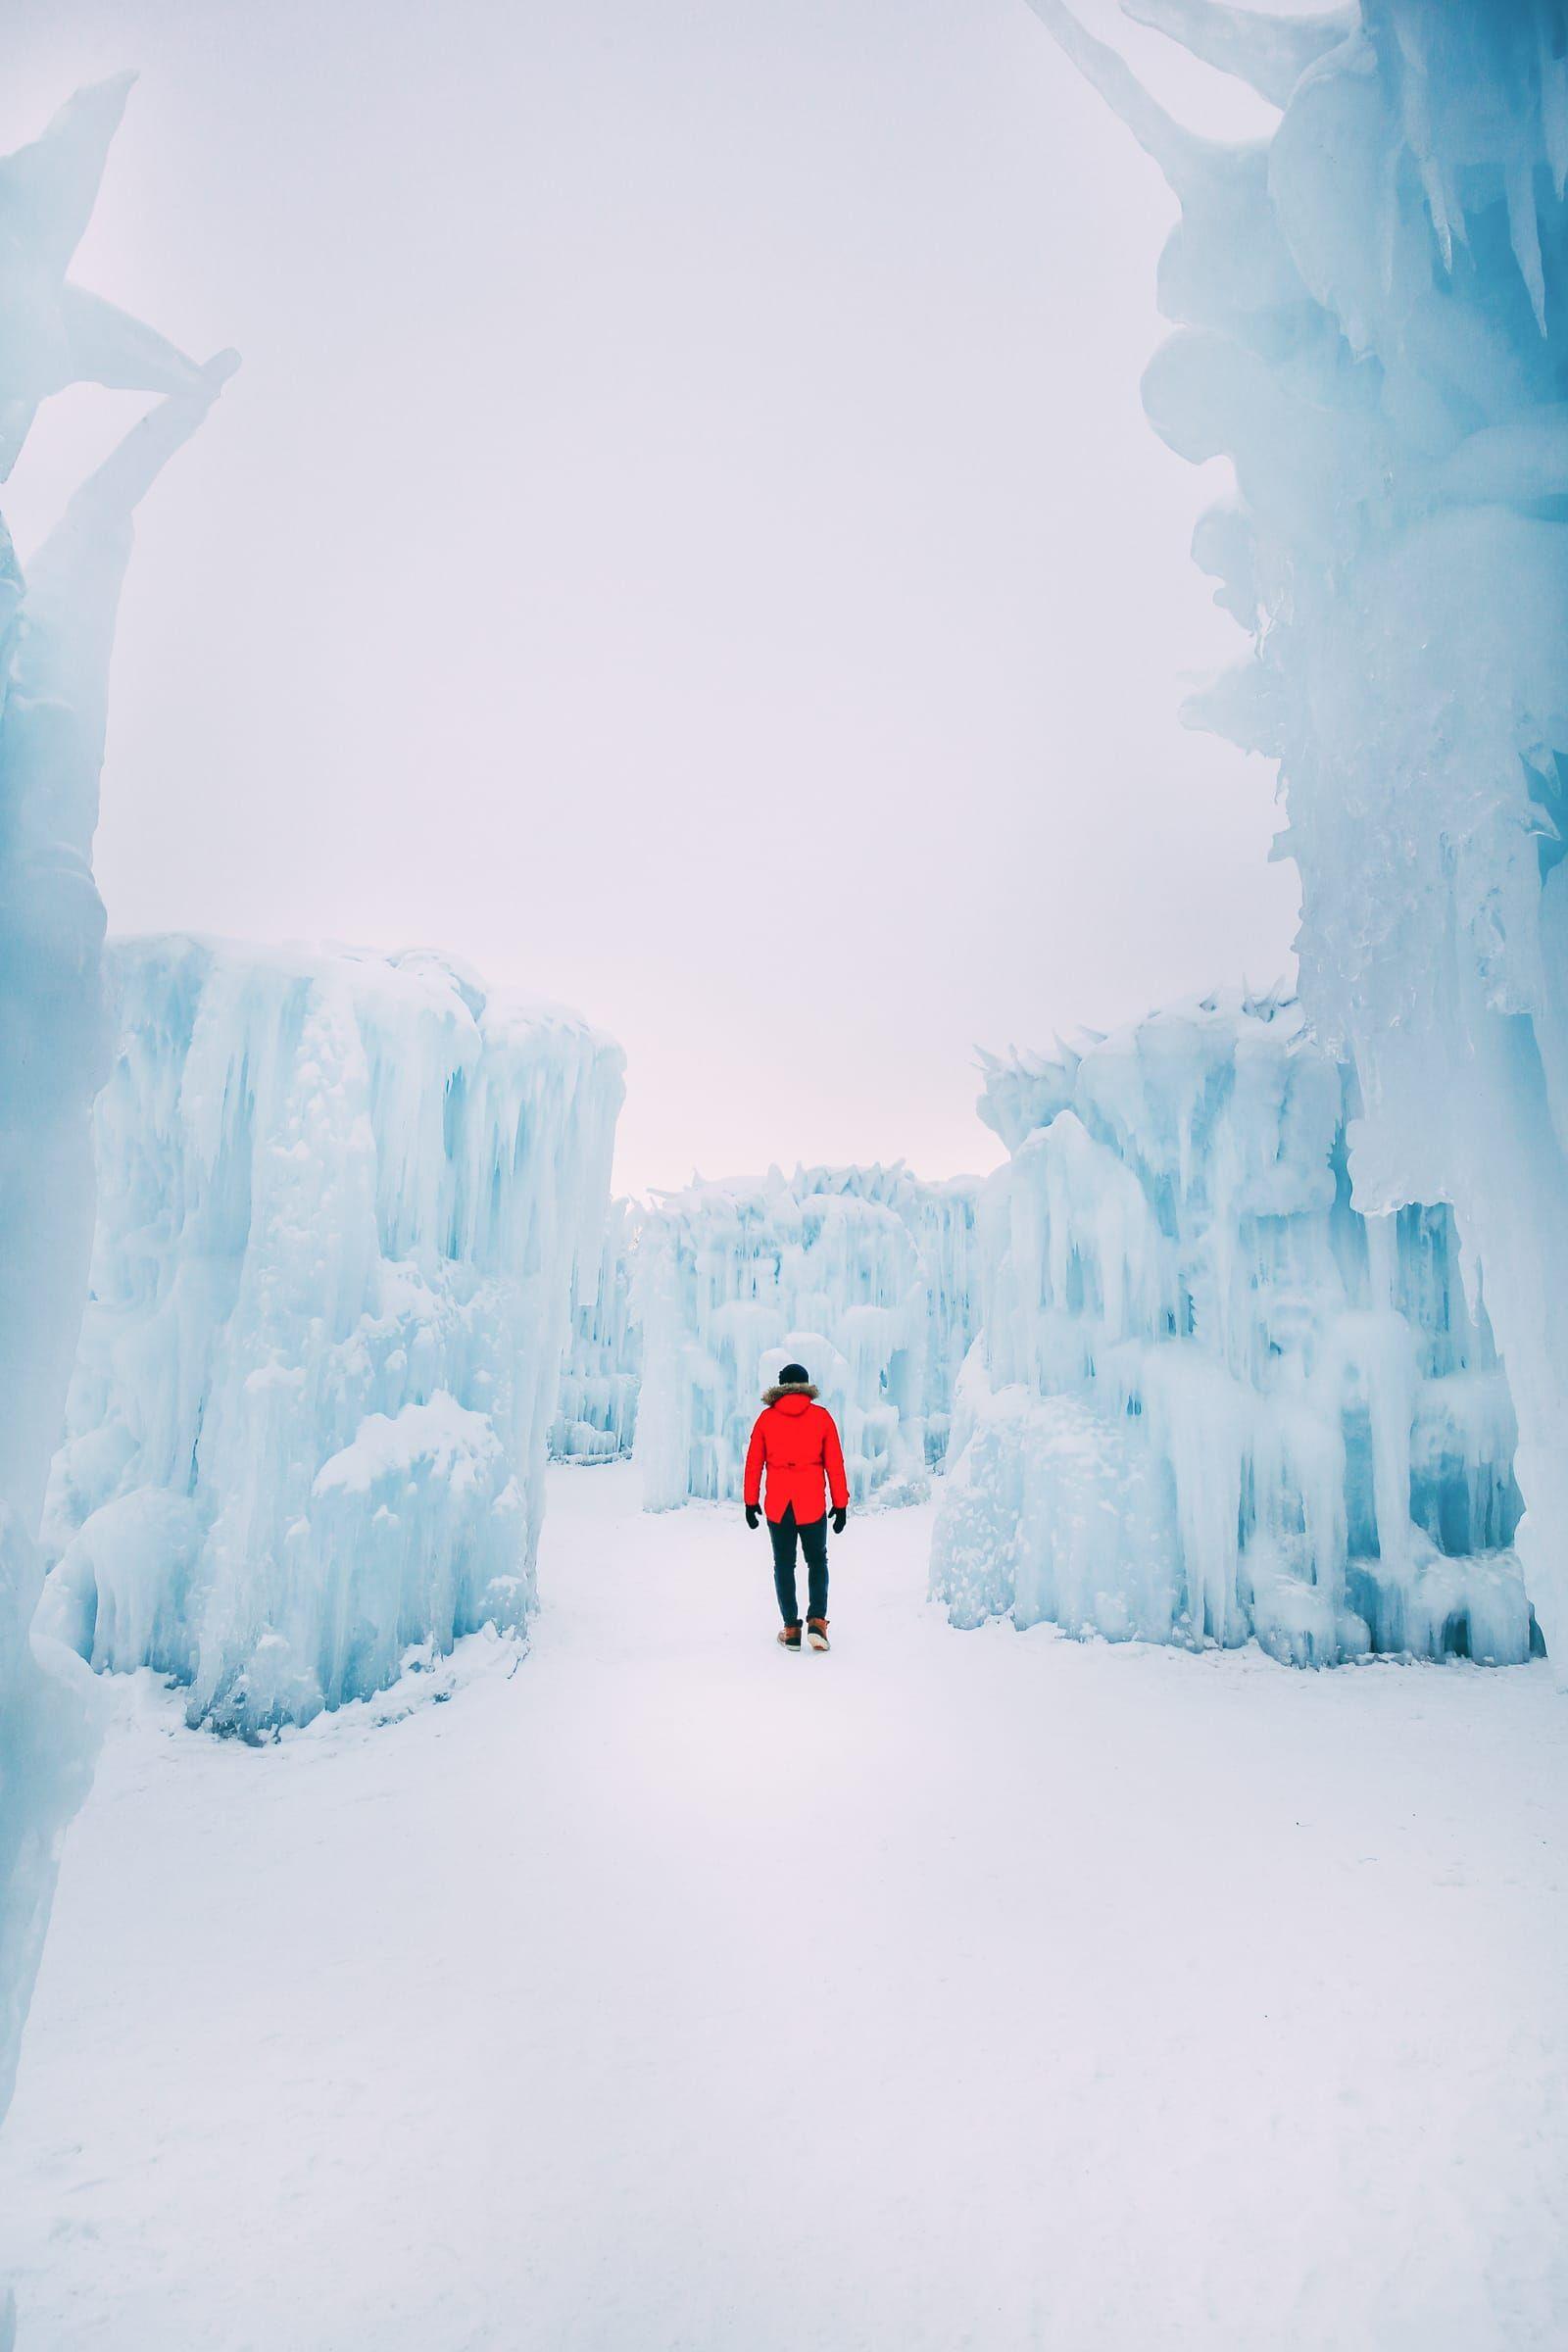 Ice Castle In Alberta, Canada canadatravel Travel